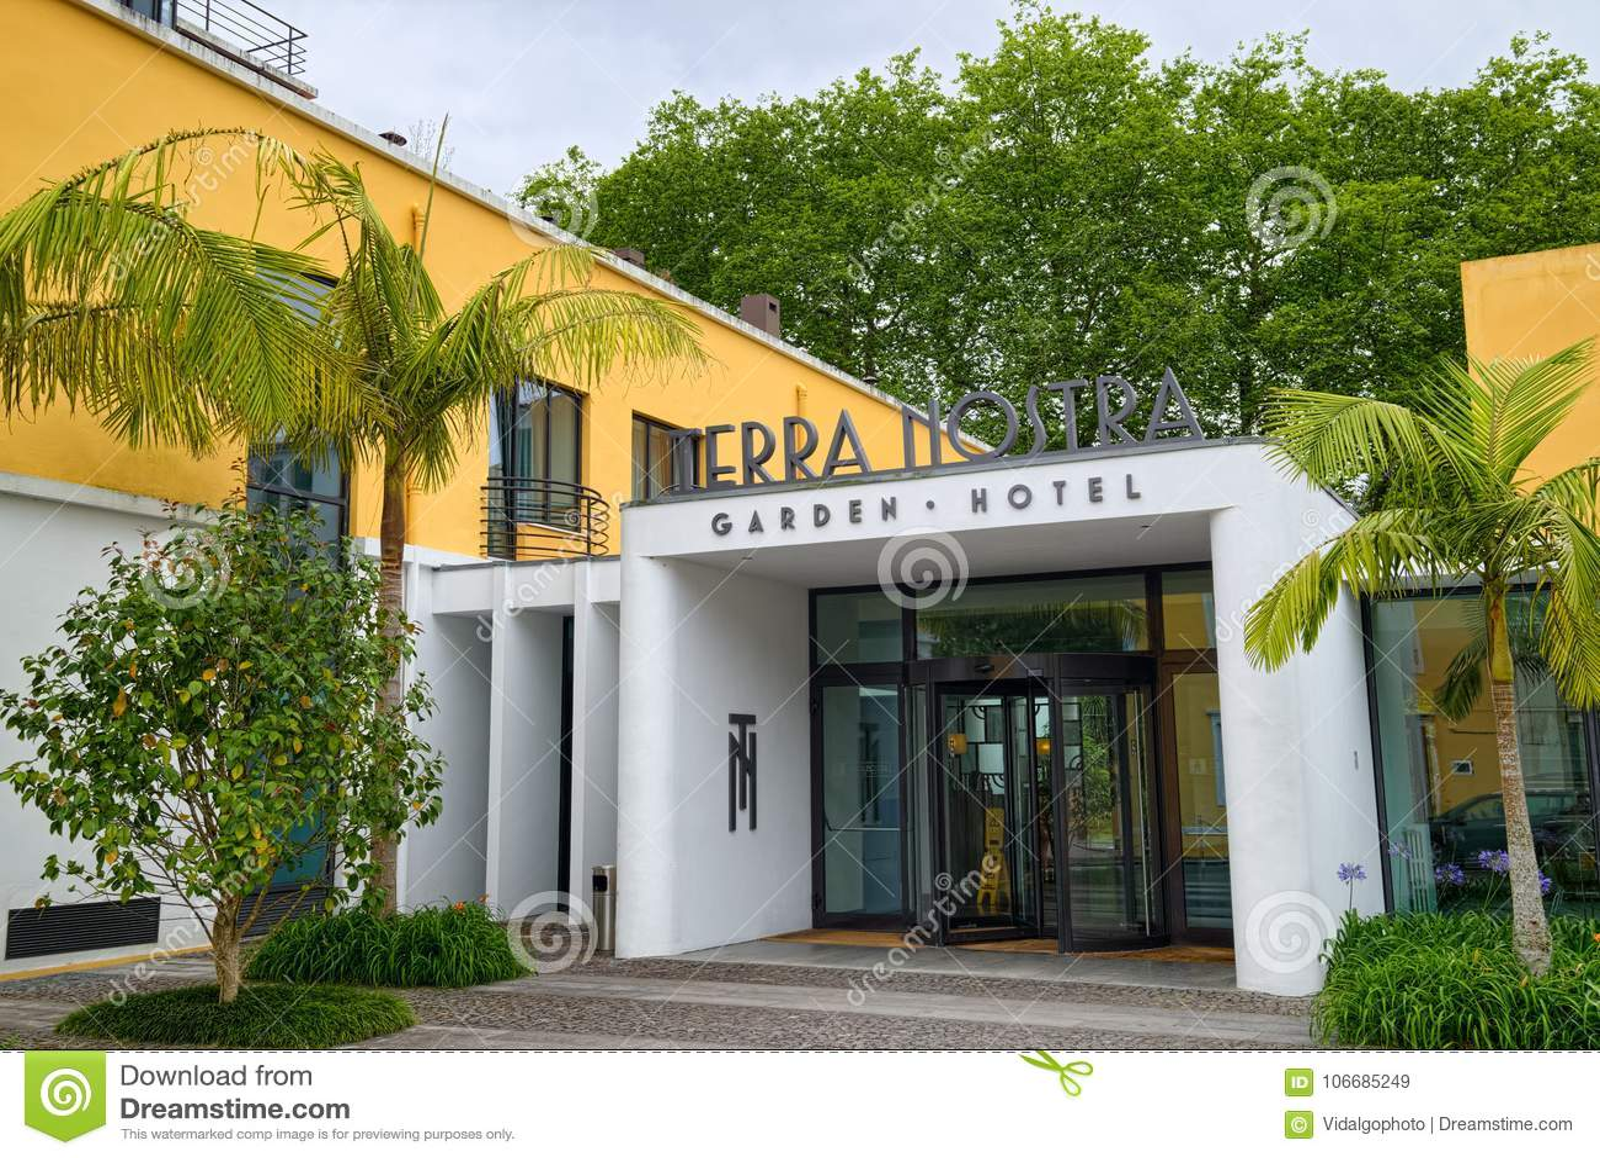 Terra Nostra Garden Hotel In Furnas Stadt Sao Miguel Insel